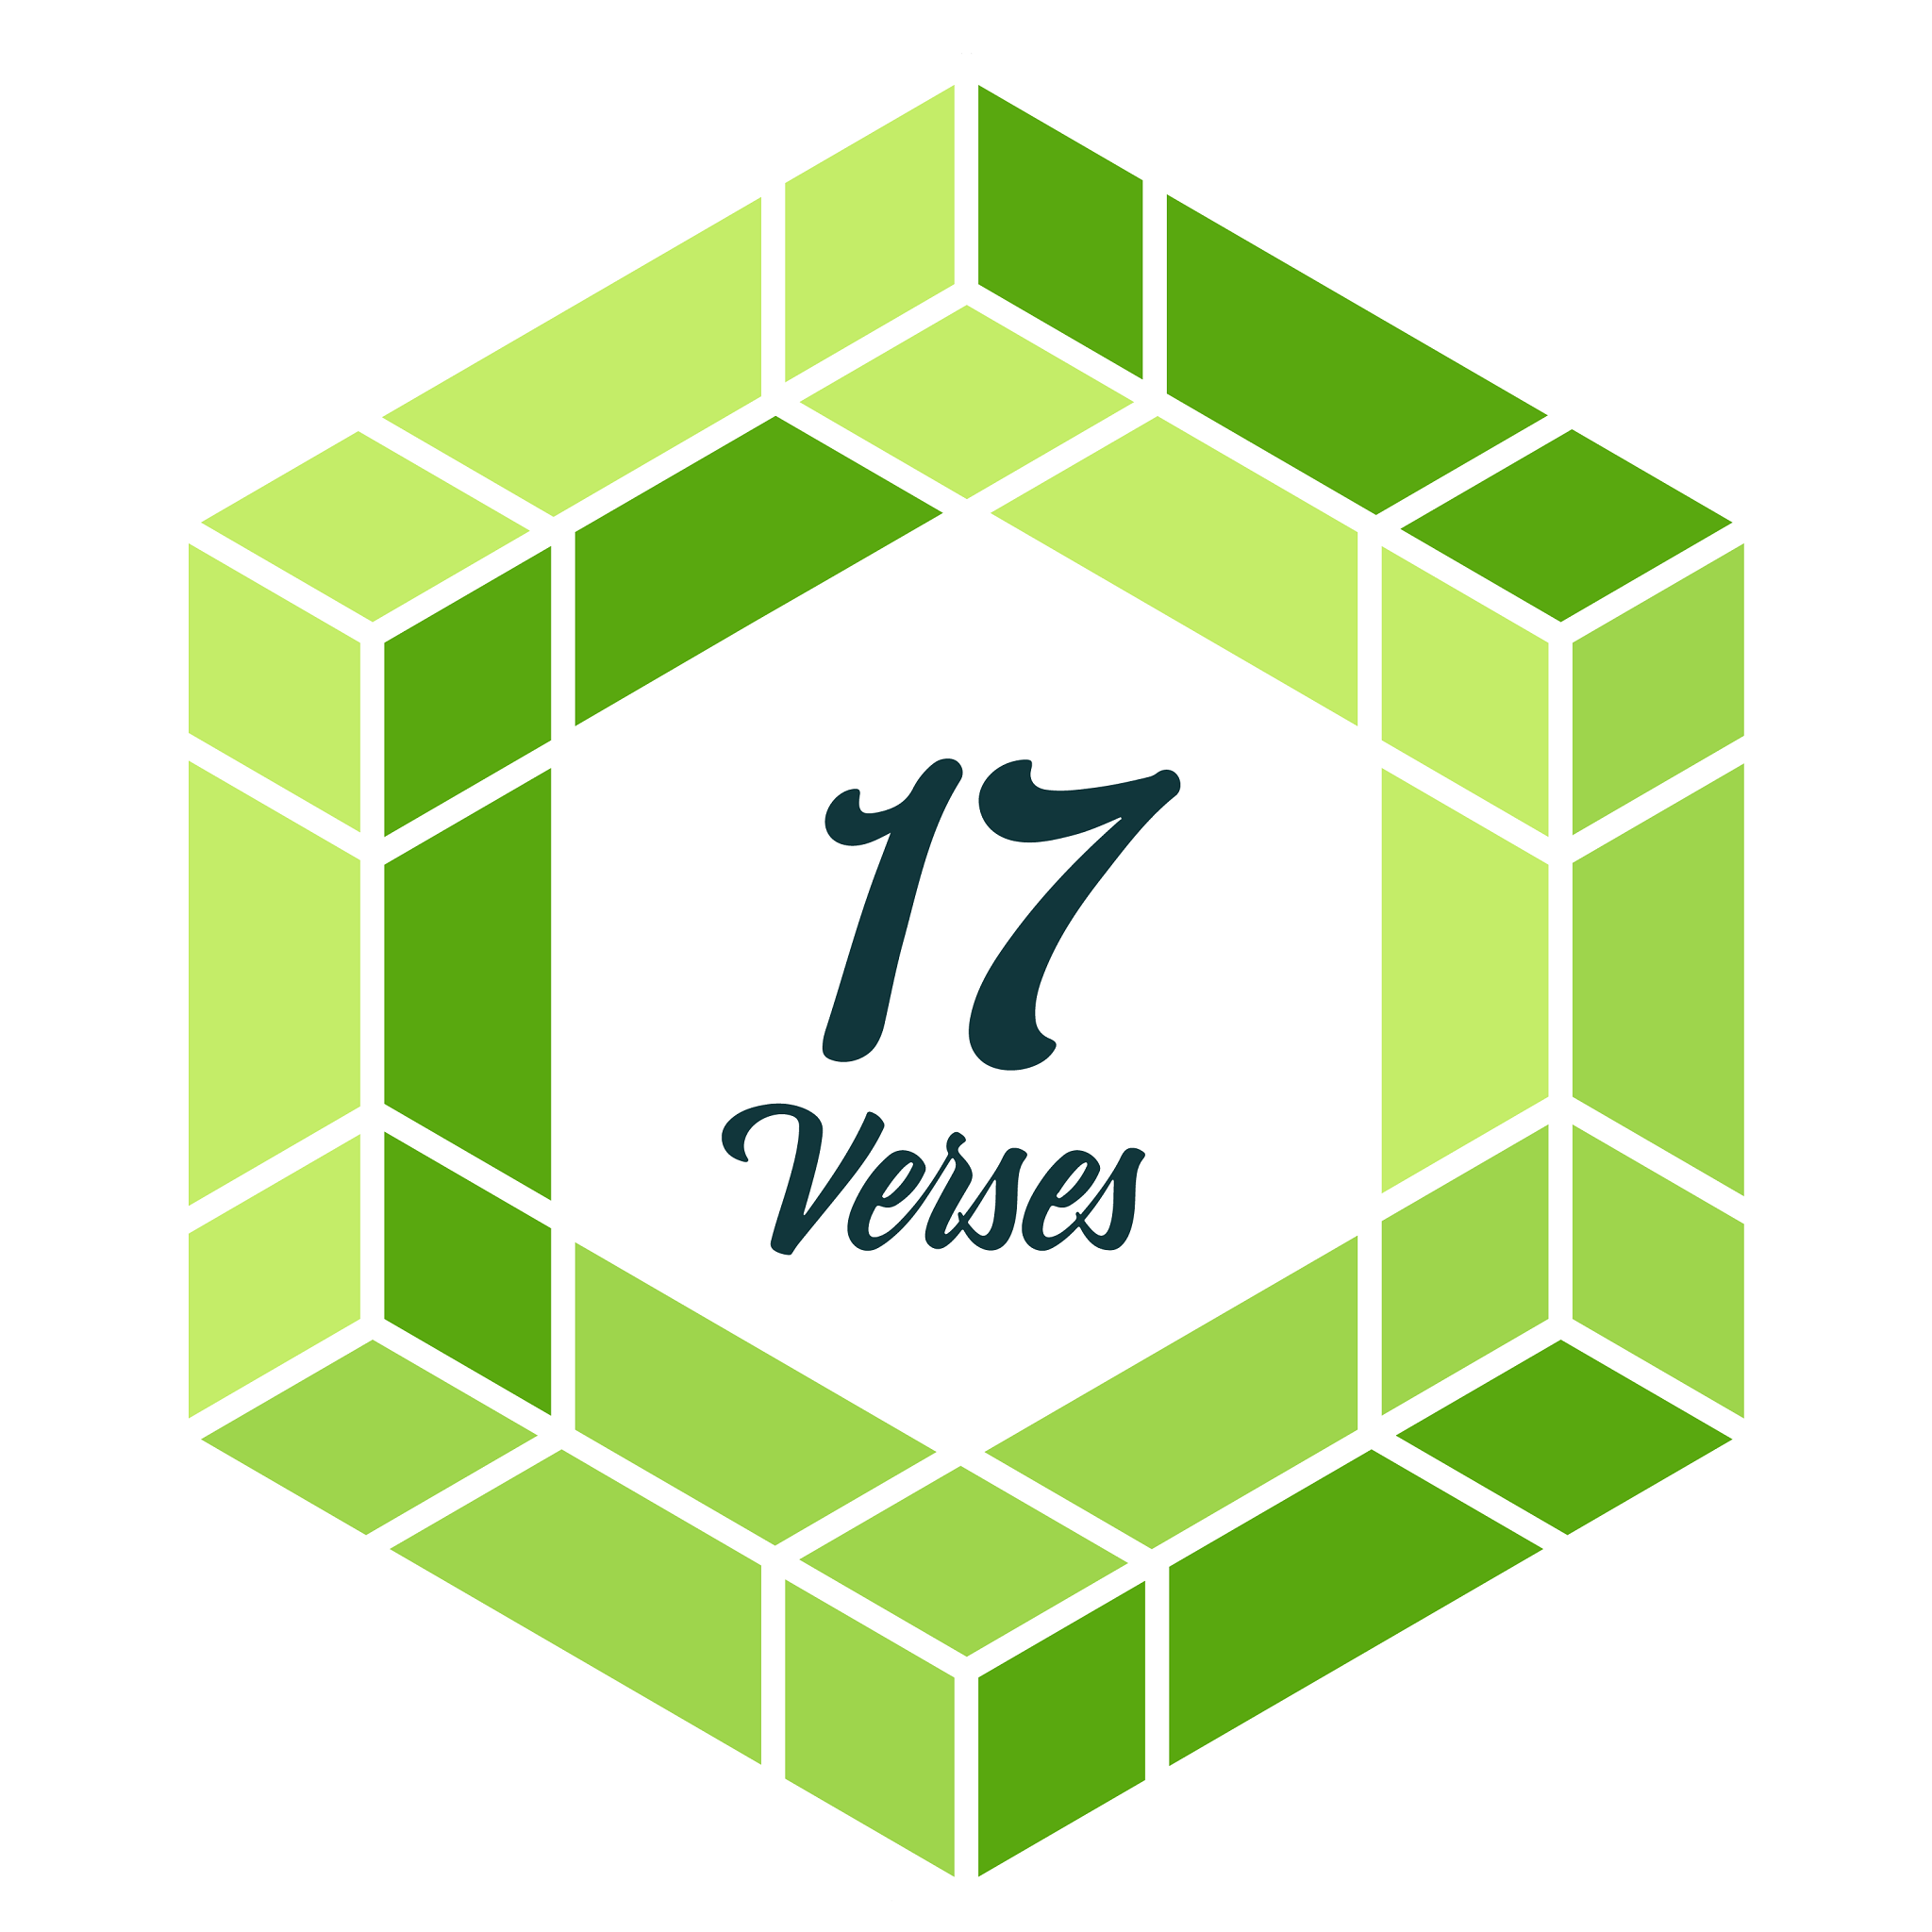 Year 2 - Surah 21 (Al-Anbiyã'), Verses 1-10